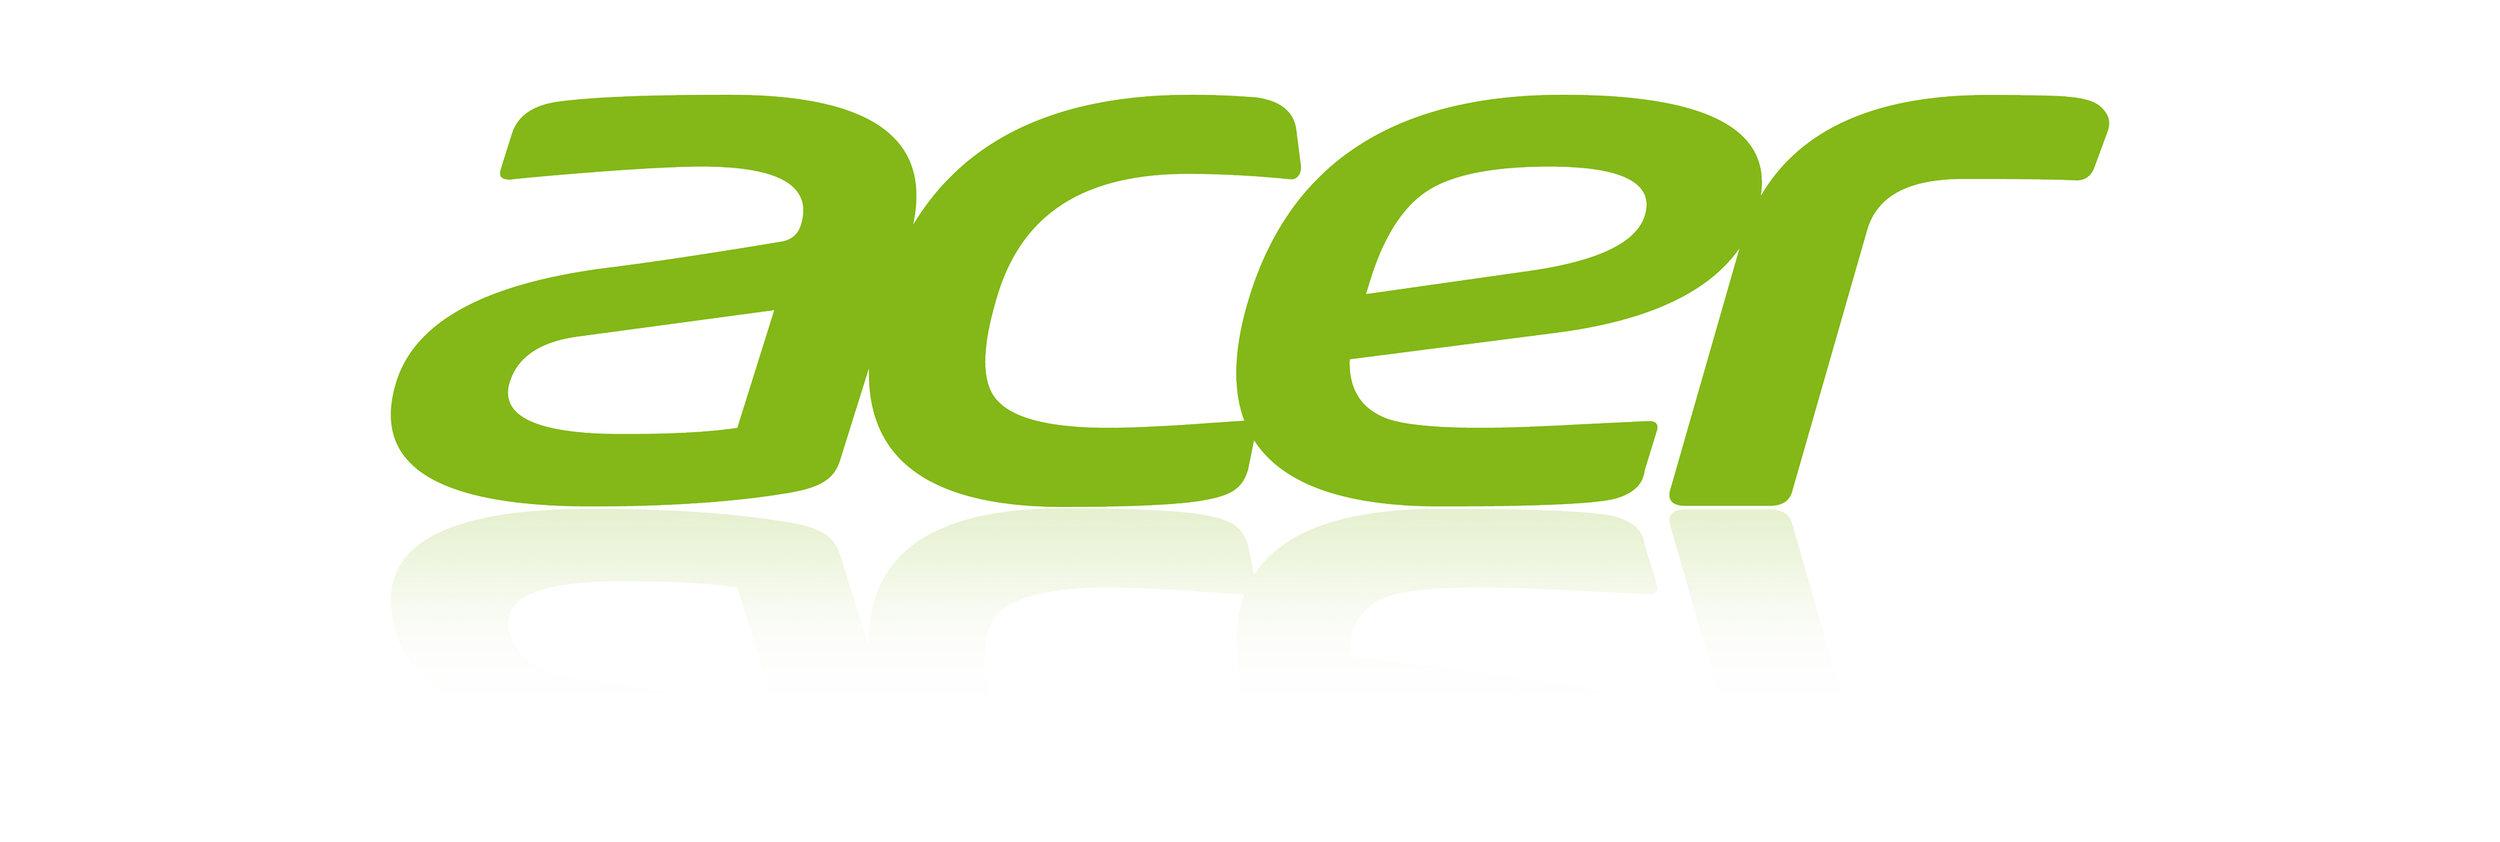 Acer logo_bh.jpg